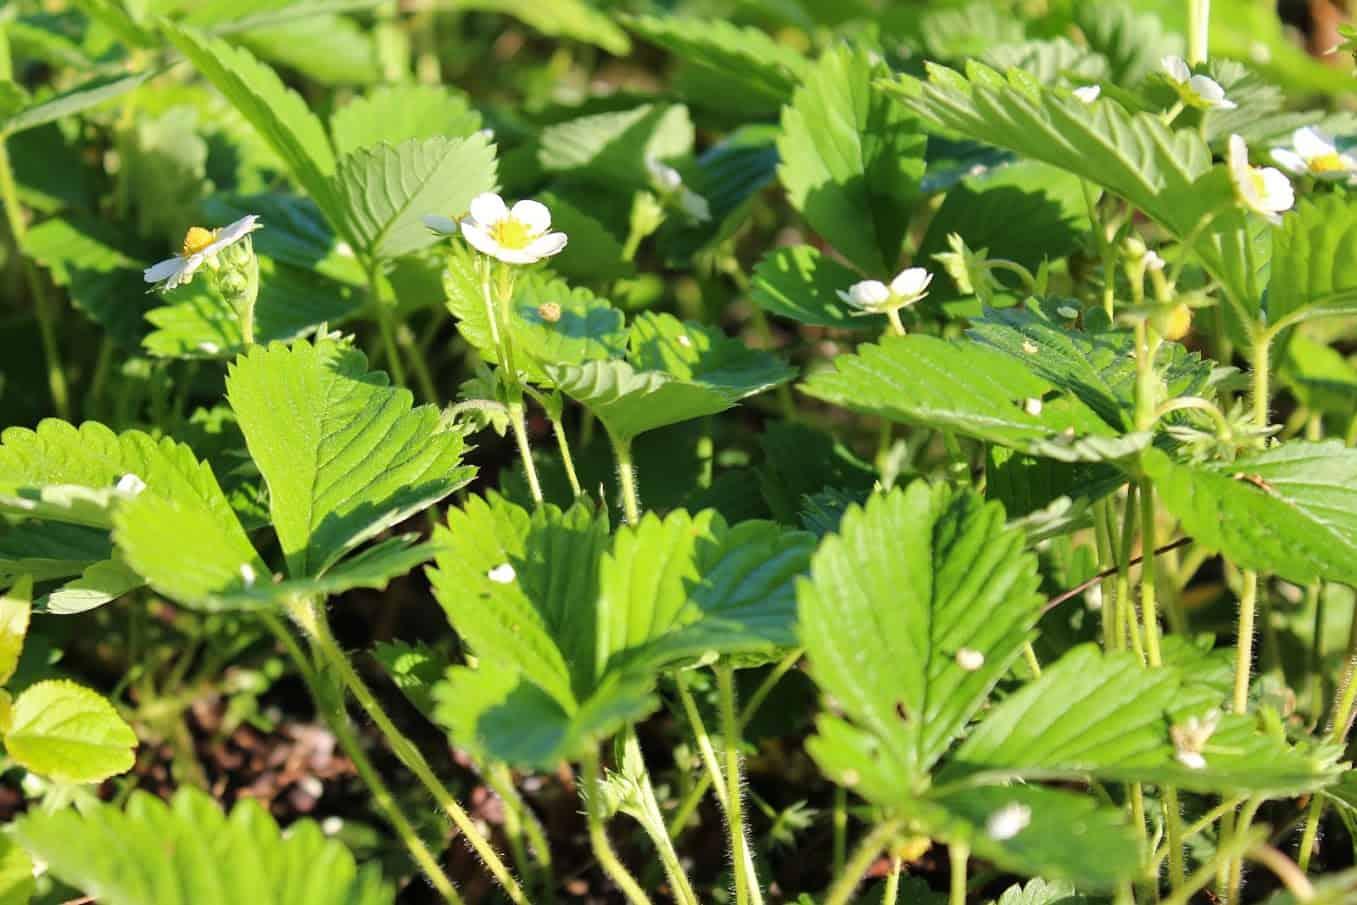 Wild Strawberry Plants - Saratoga Seed